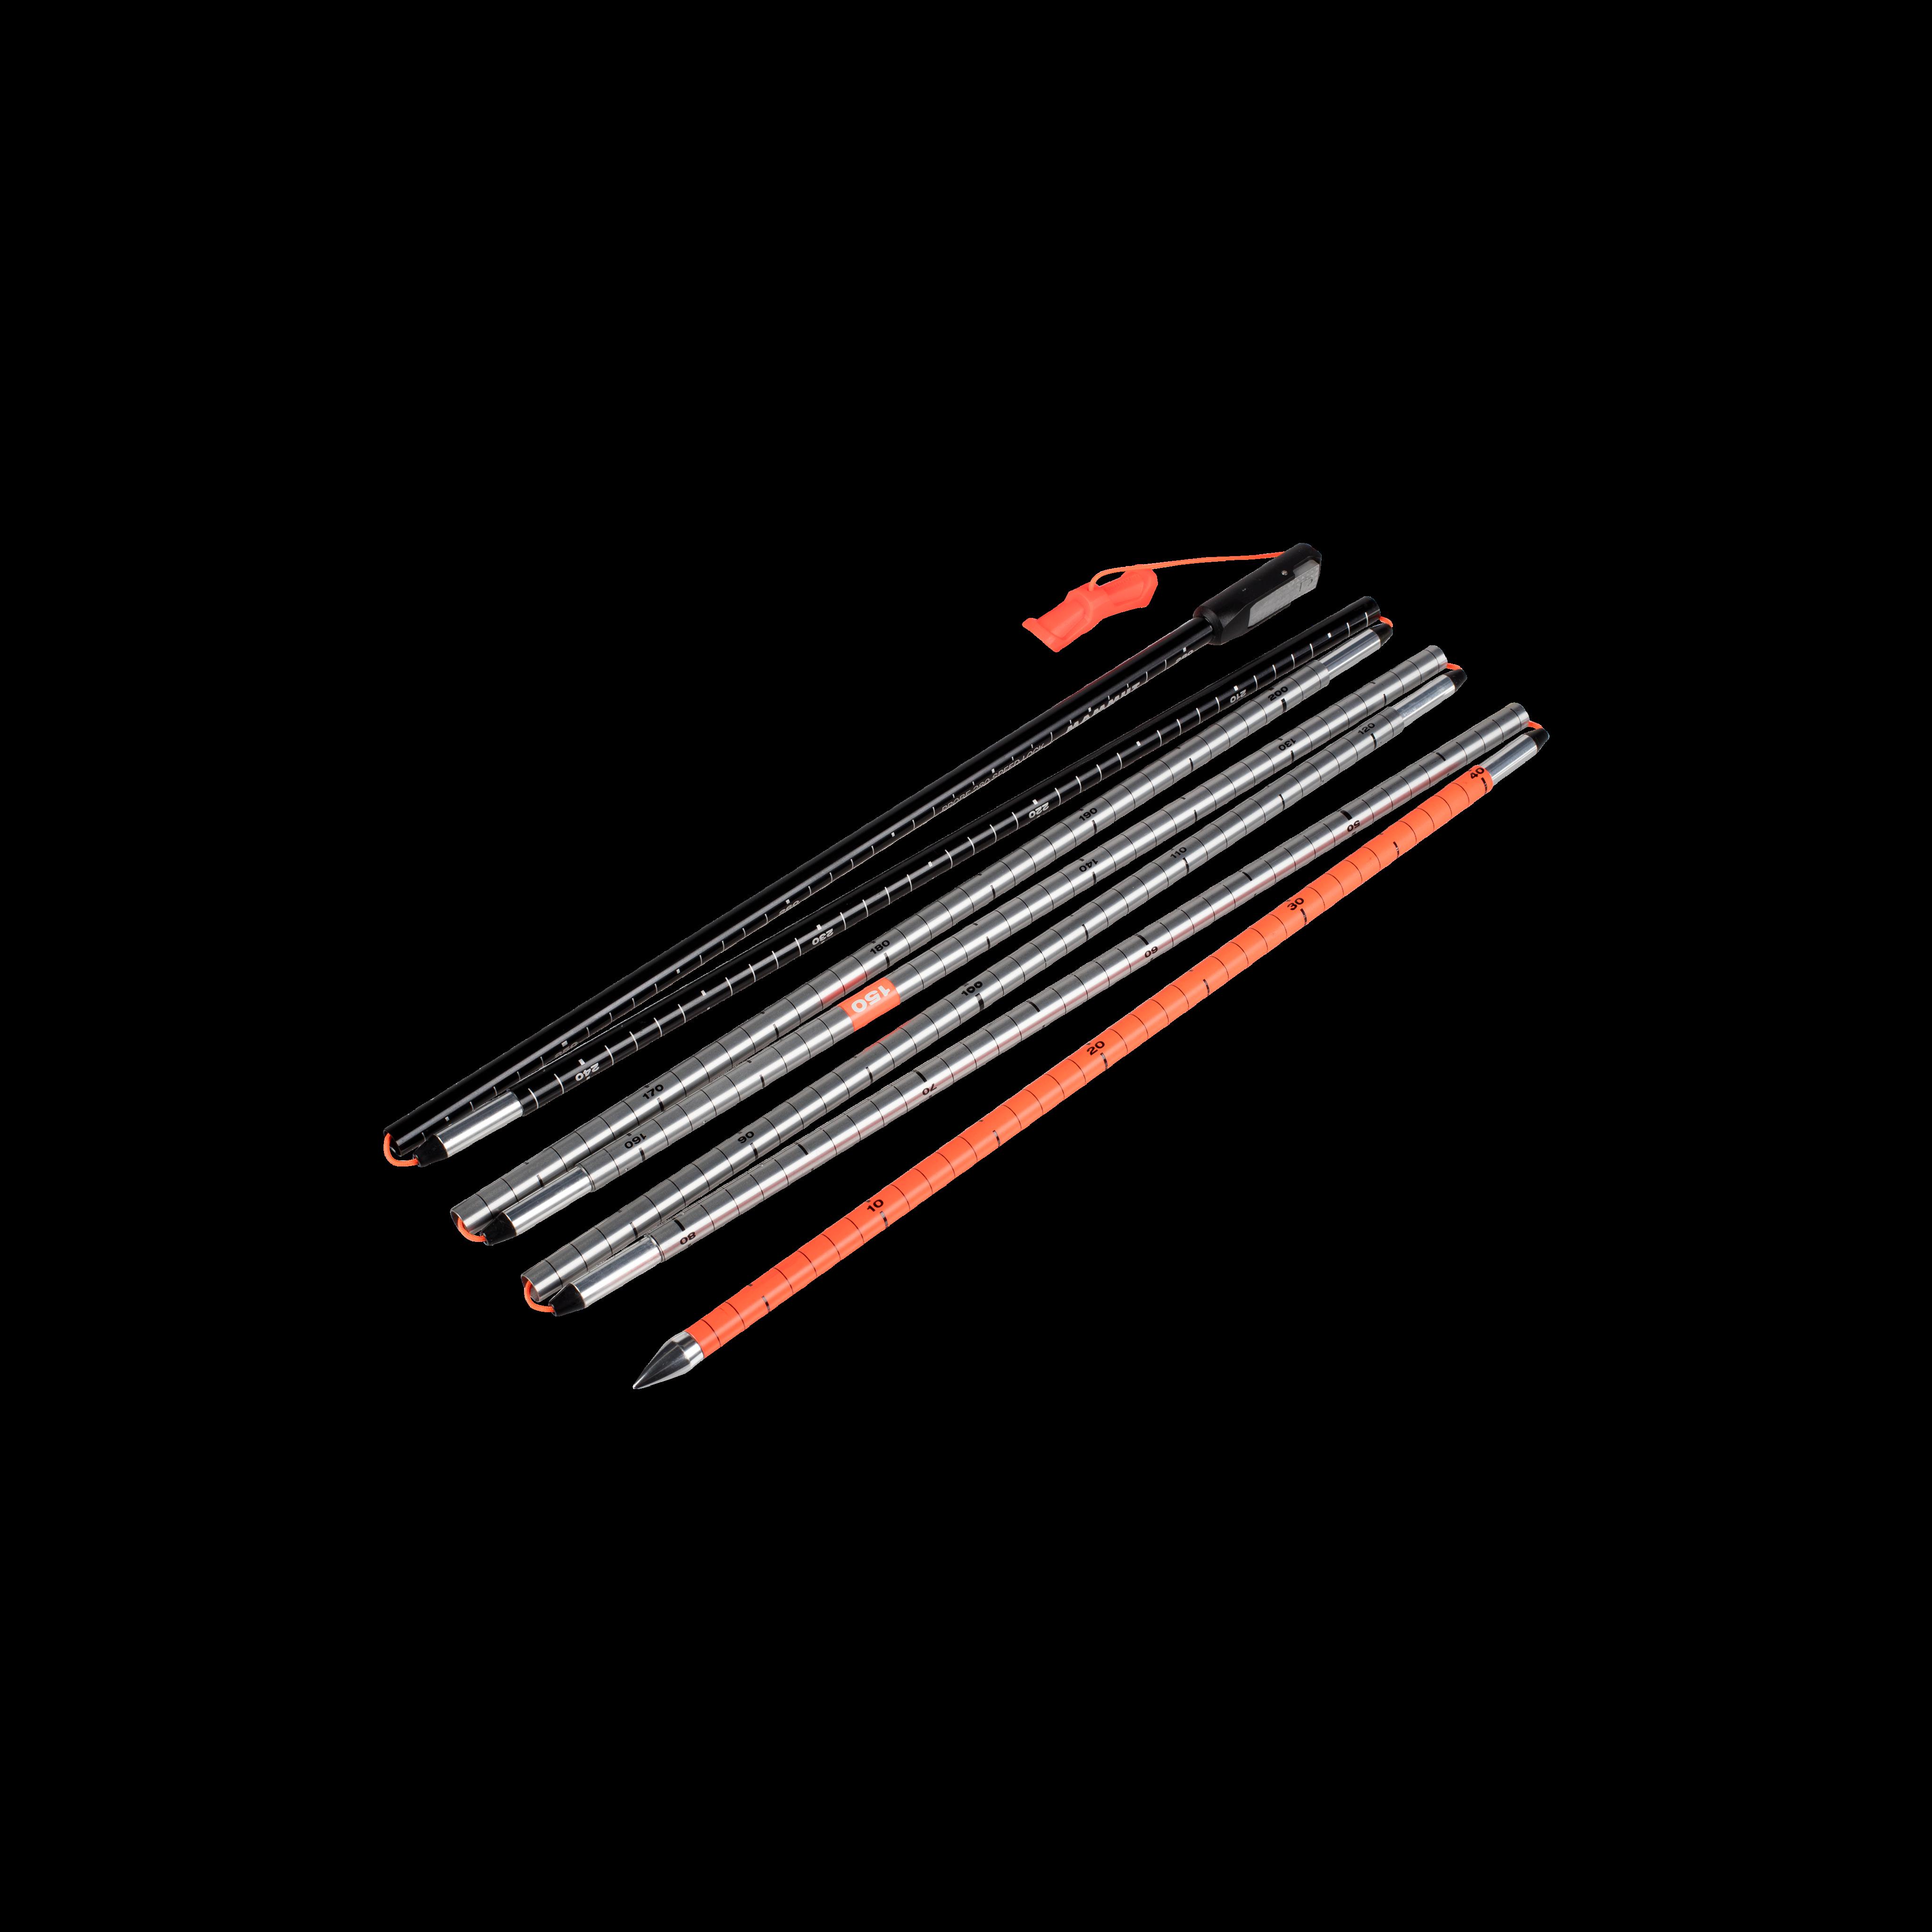 Probe 280 speed lock - neon orange, one size thumbnail